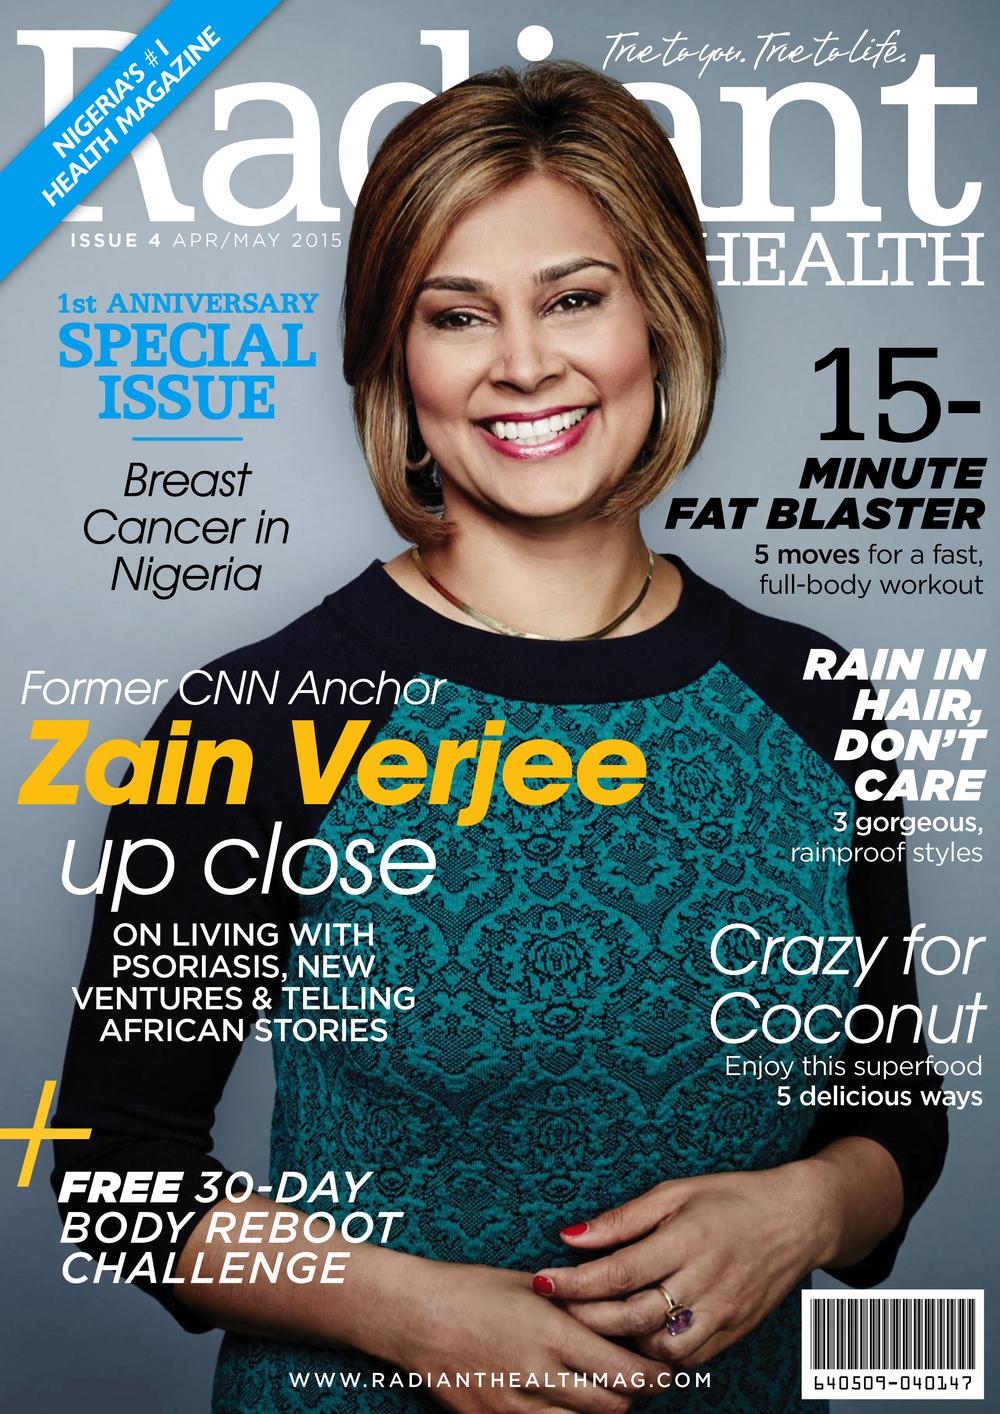 Nnenna Kalu Makanjuola Radiant Health Magazine